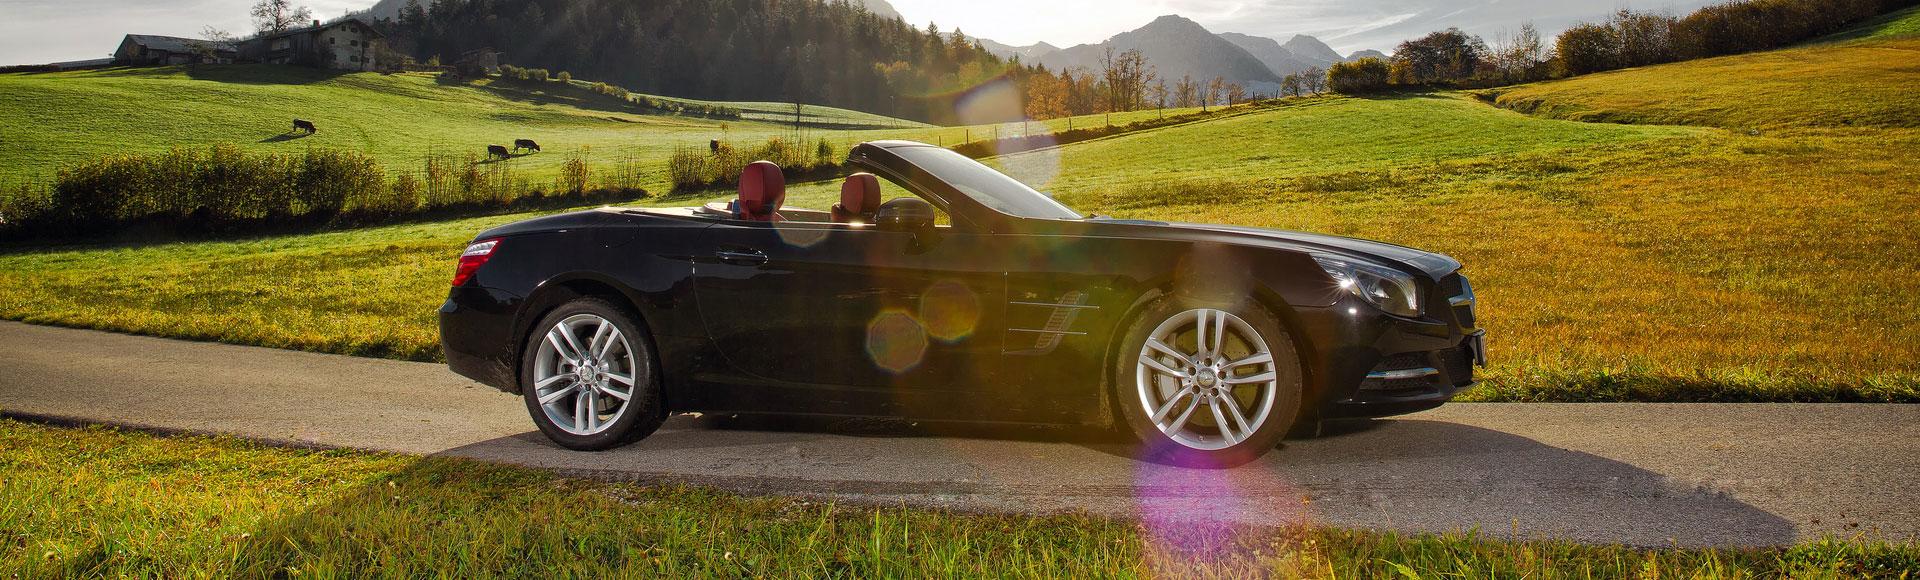 Mercedes Benz SL 500 2012 Herbst 34878